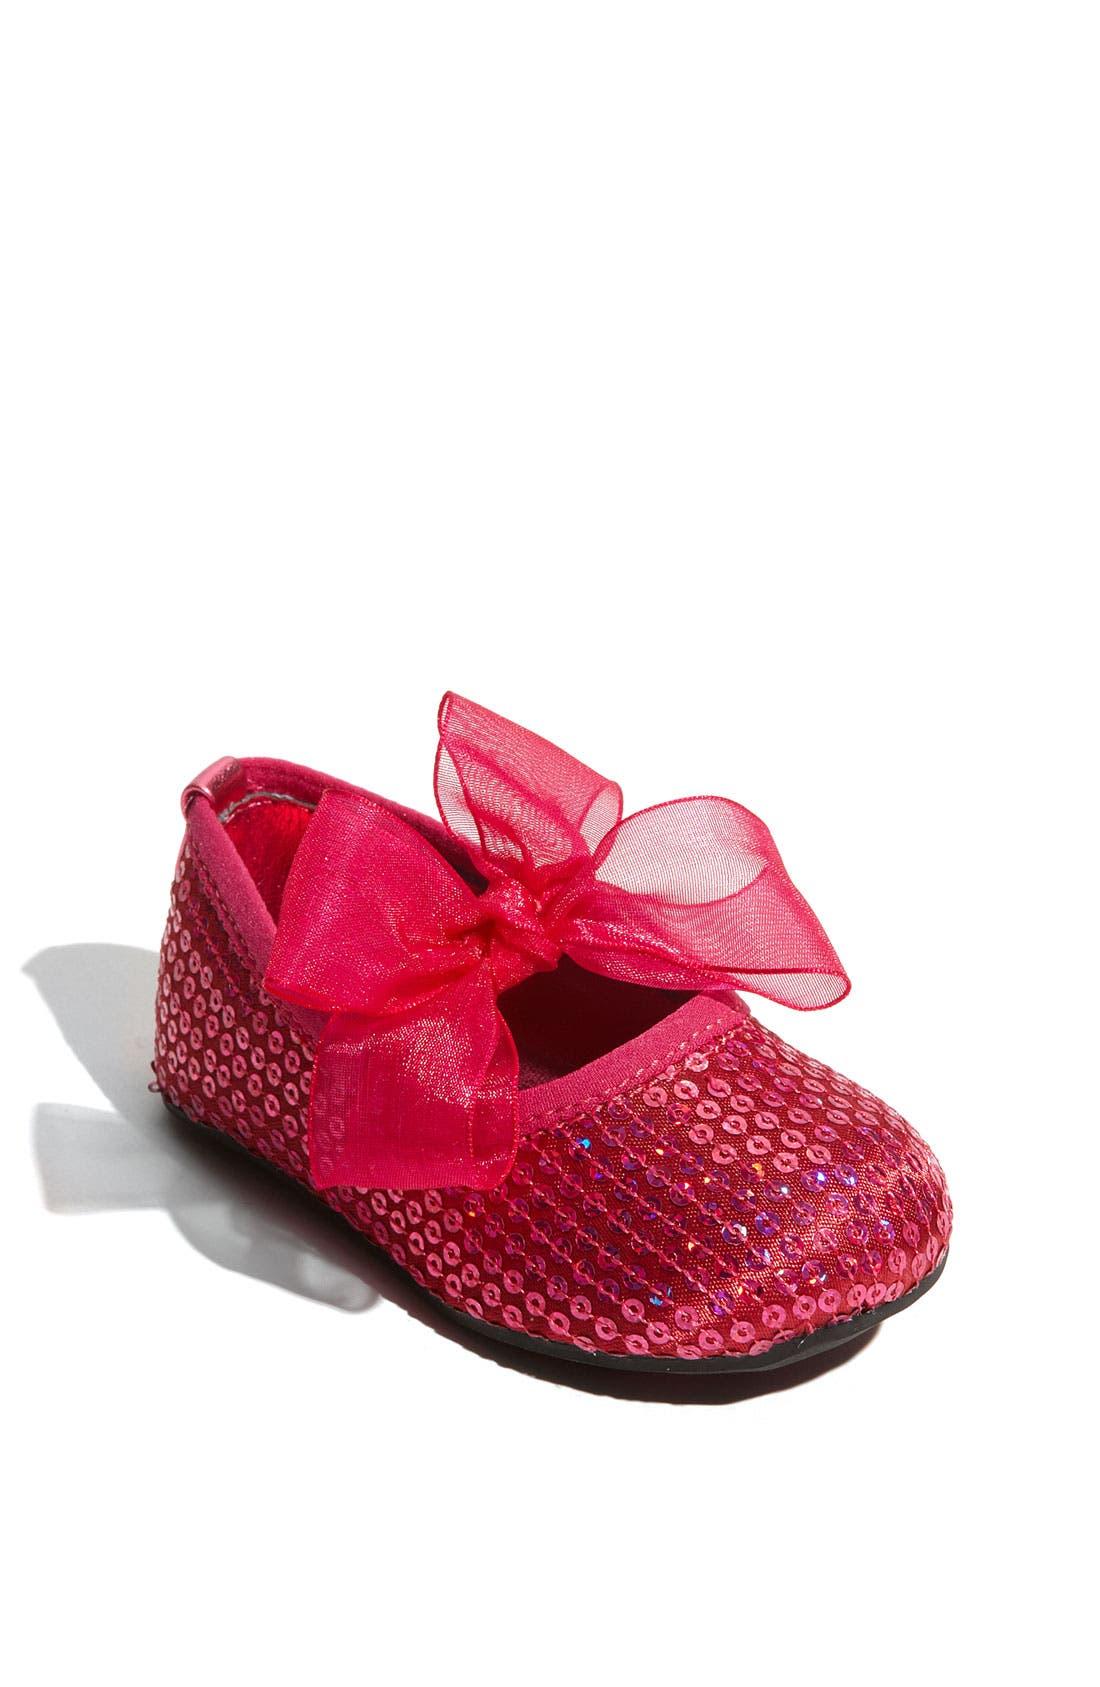 Main Image - Stuart Weitzman 'Baby Bling' Crib Shoe (Baby & Walker)